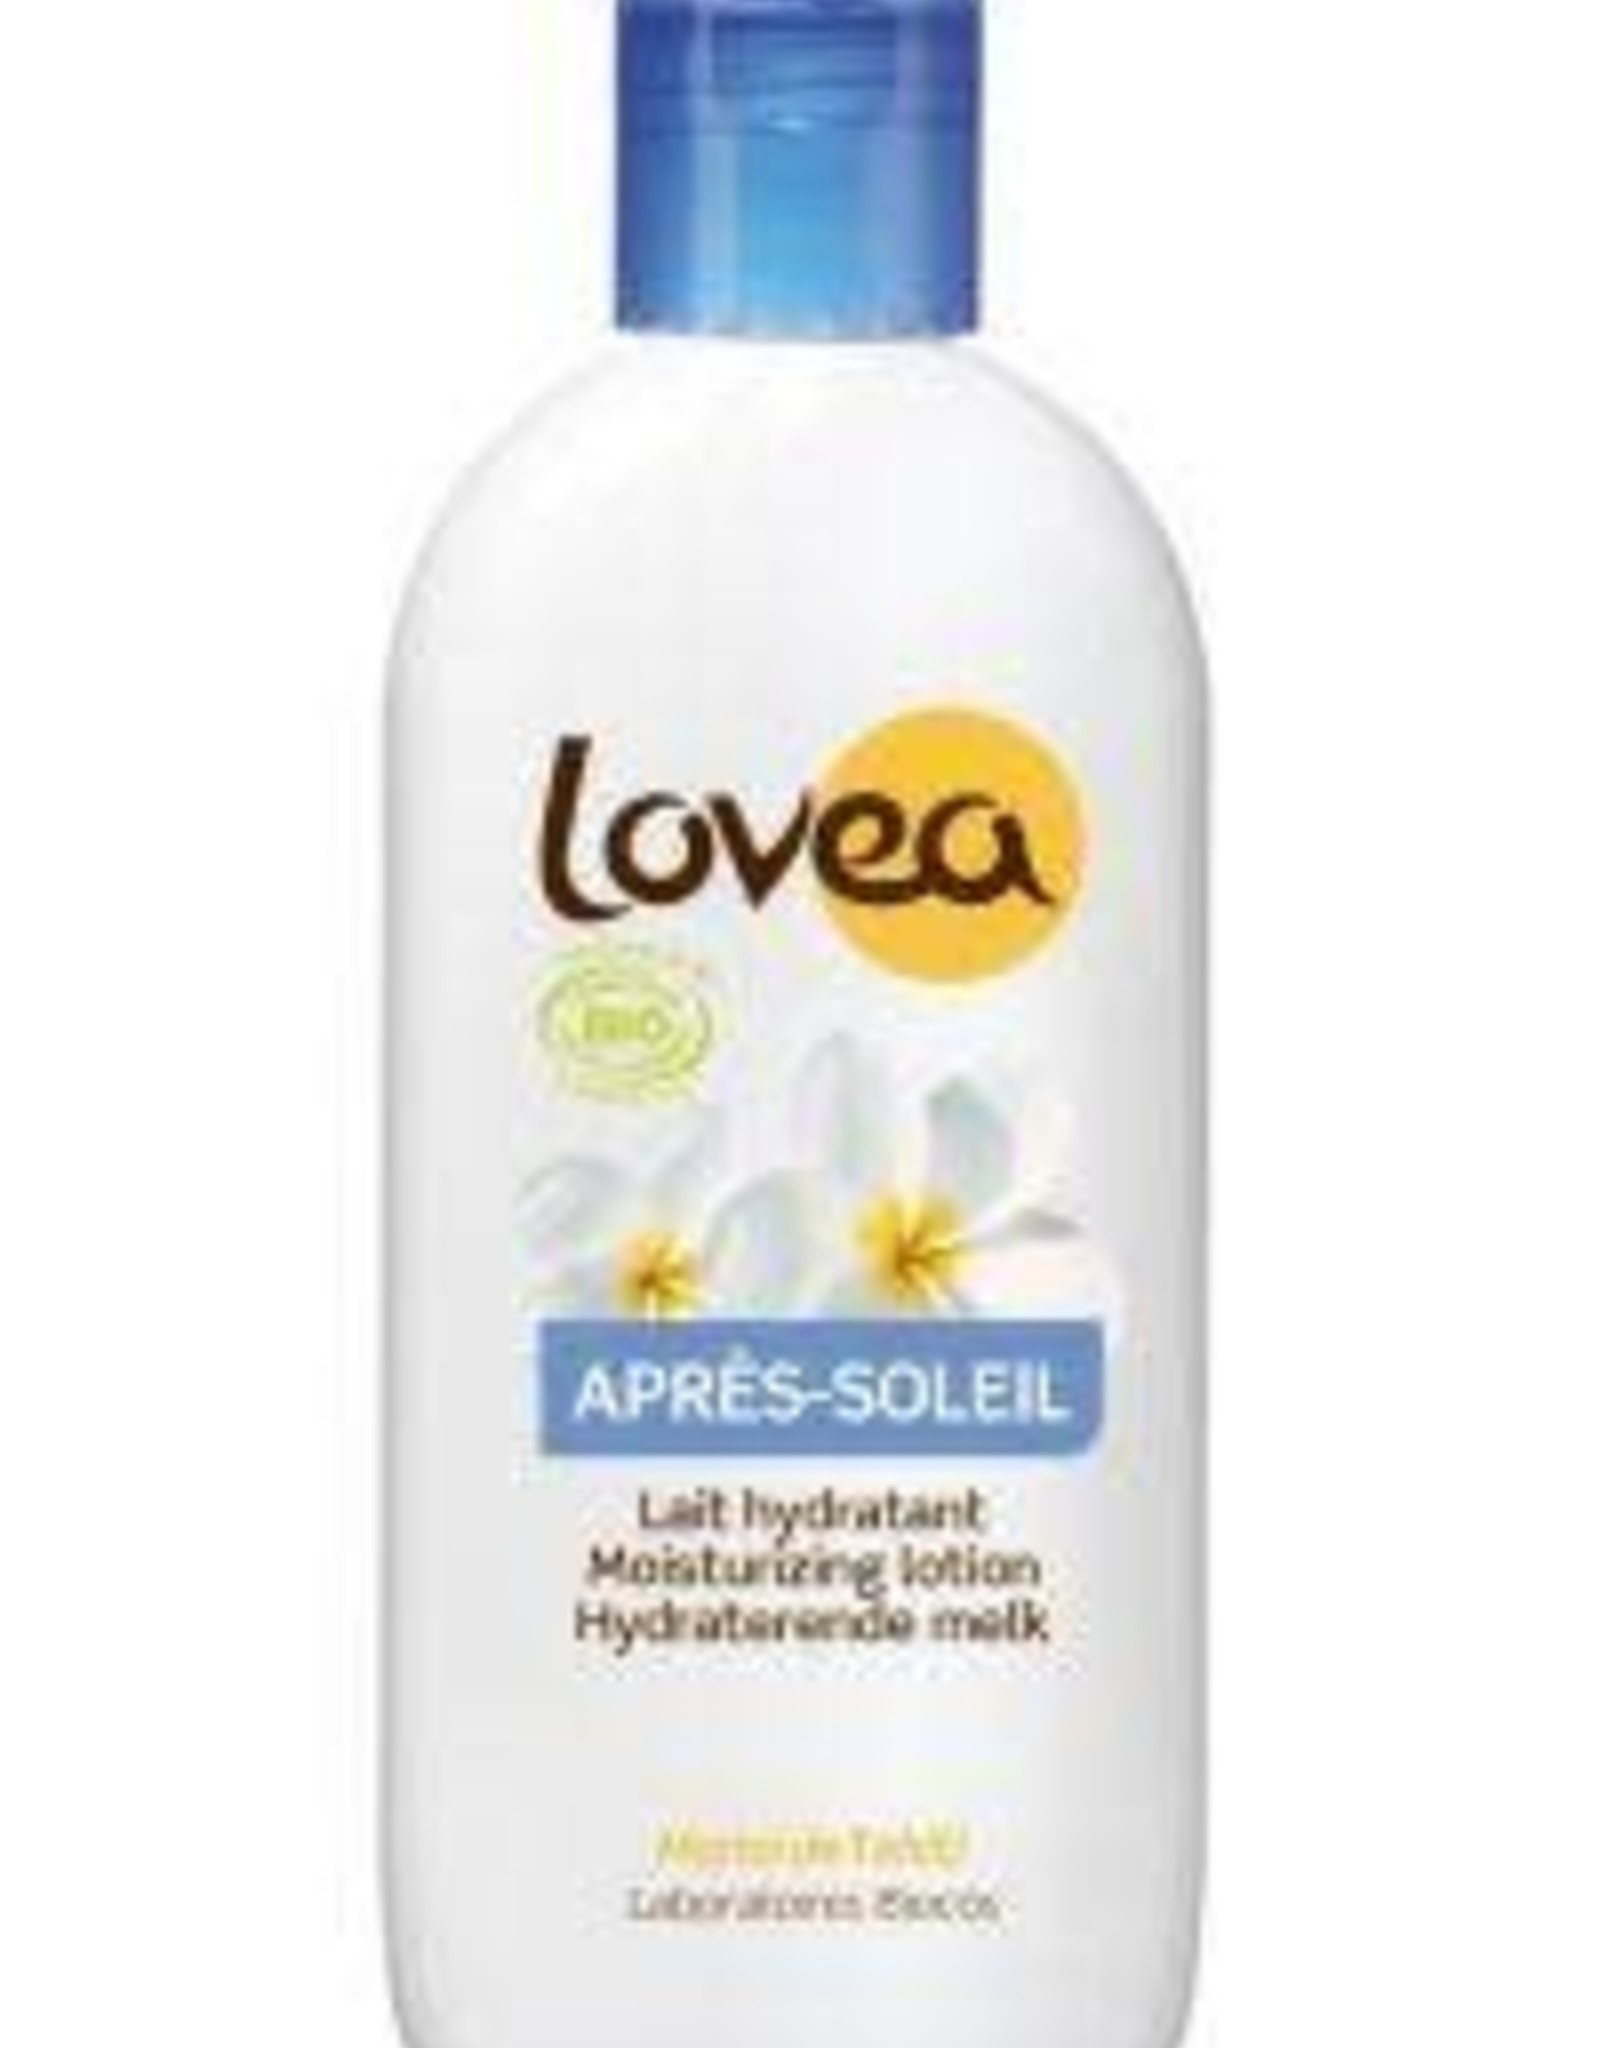 Lovea After sun lotion bio 125ml